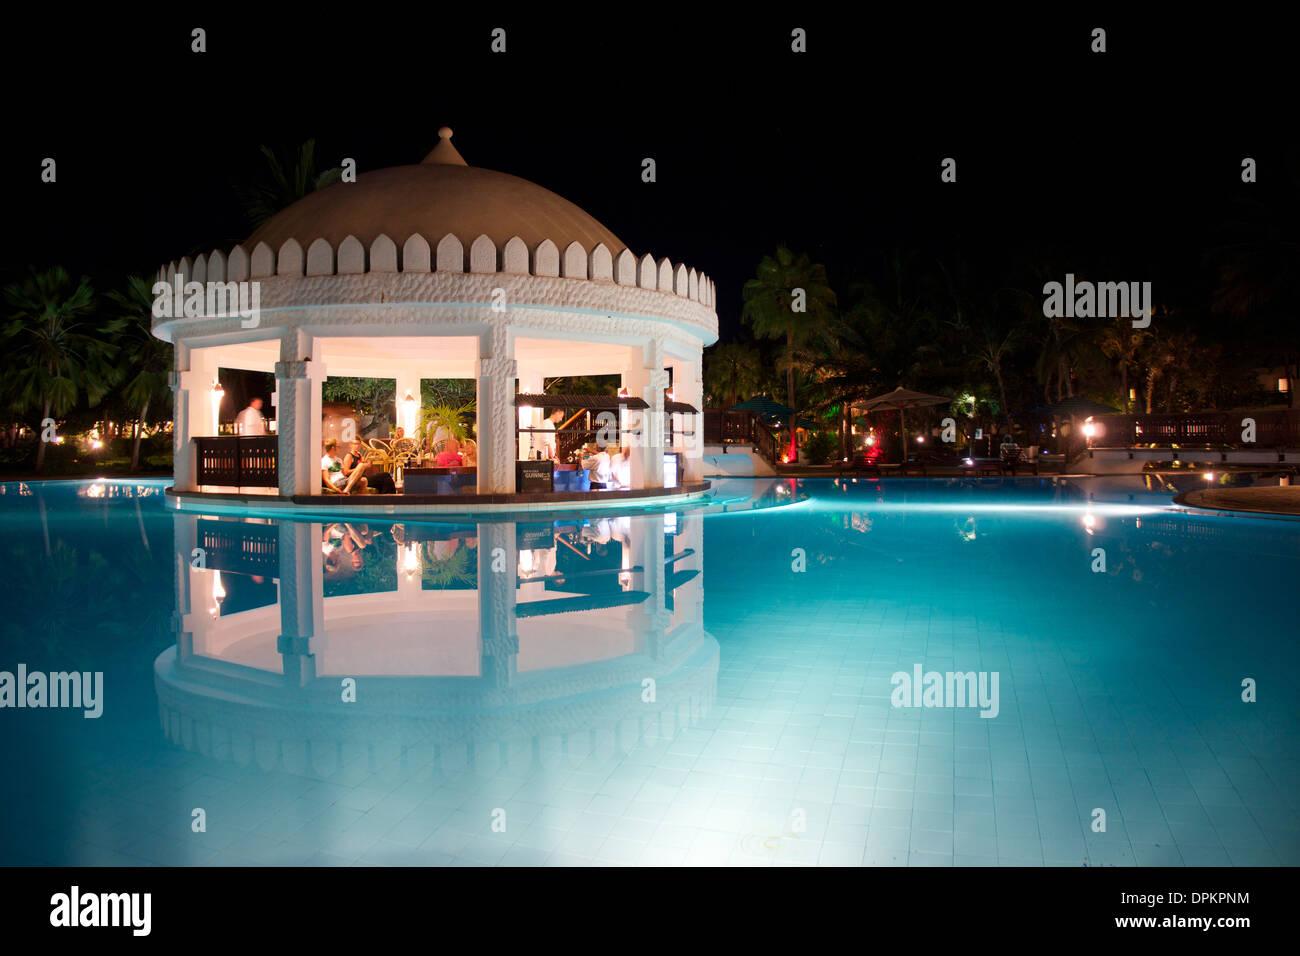 Swim up bar at night, Southern Palms Resort, Diani Beach, Kenya - Stock Image